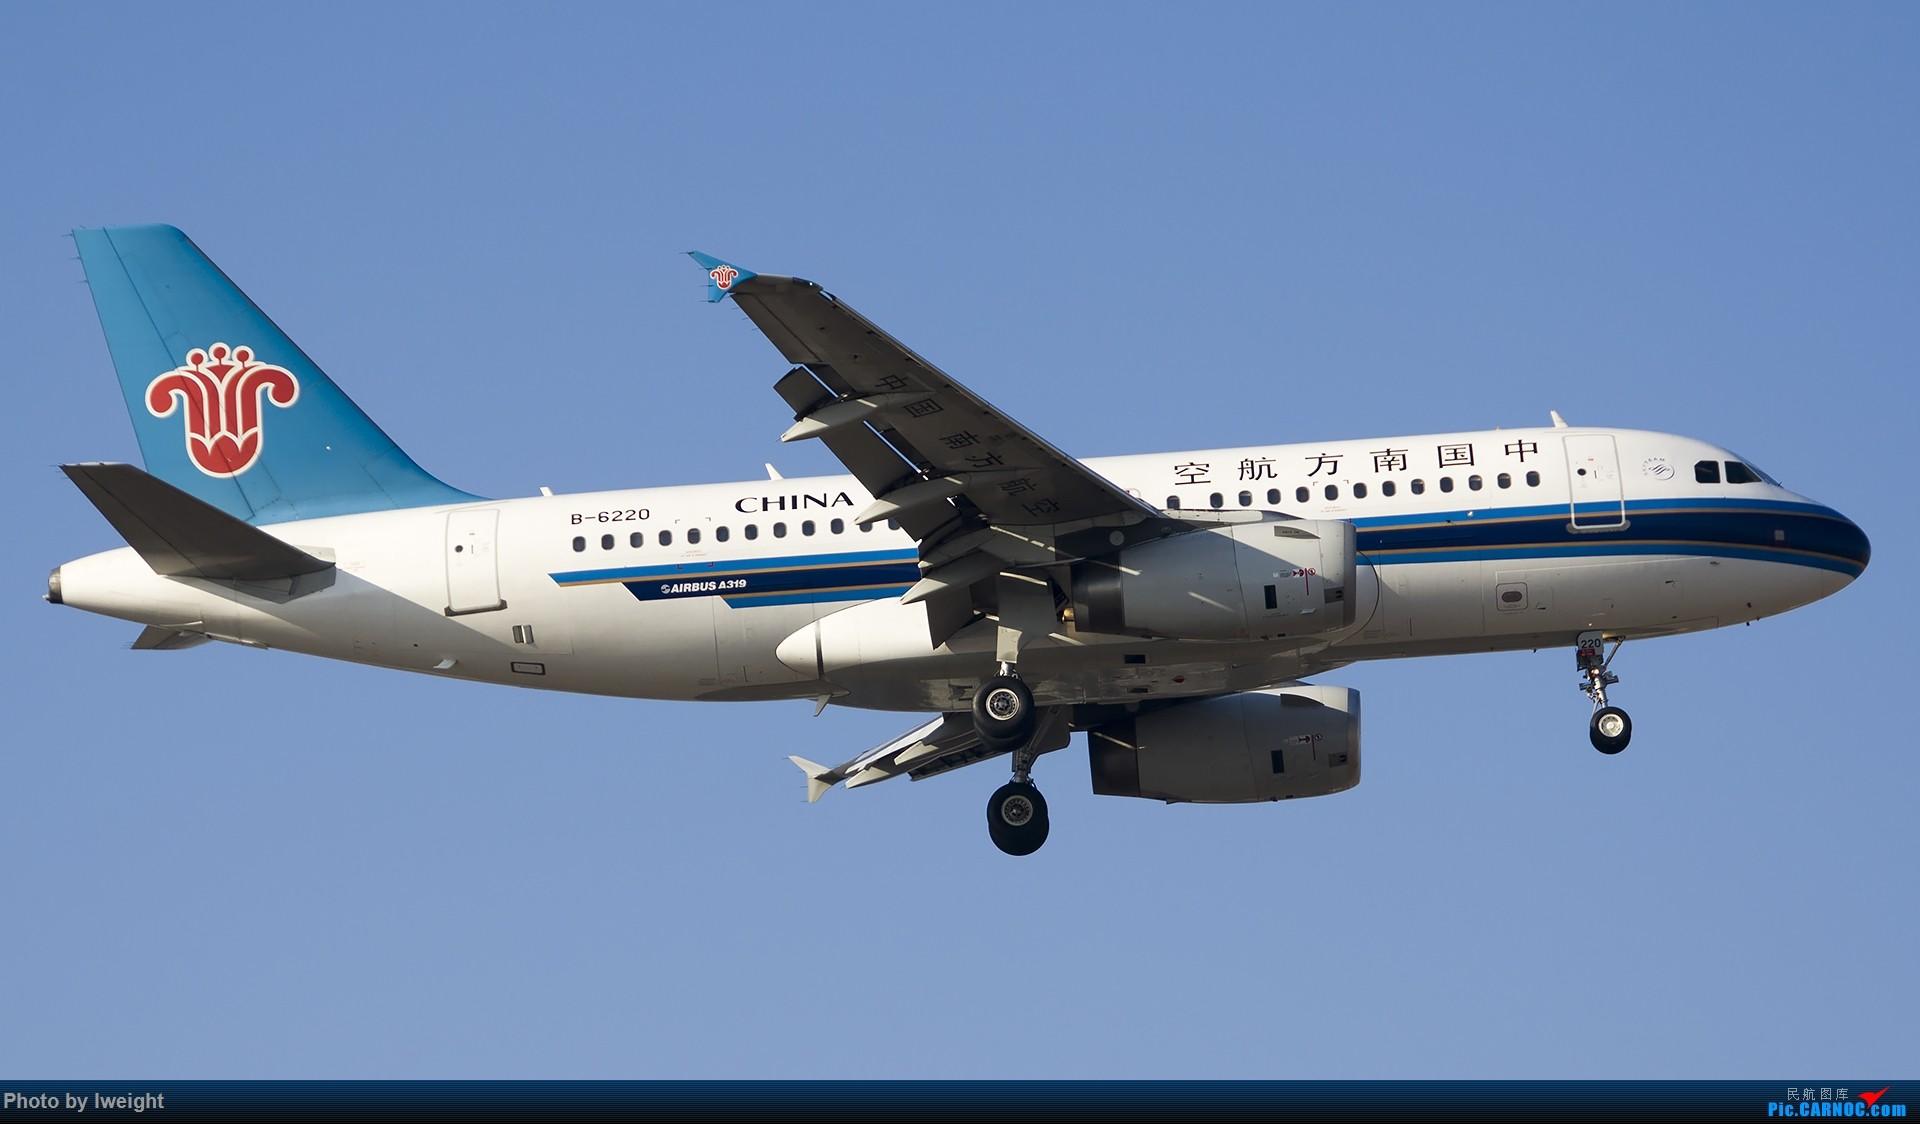 Re:[原创]庆祝升级777,发上今天在首都机场拍的所有飞机【2014-12-14】 AIRBUS A319-100 B-6220 中国北京首都国际机场